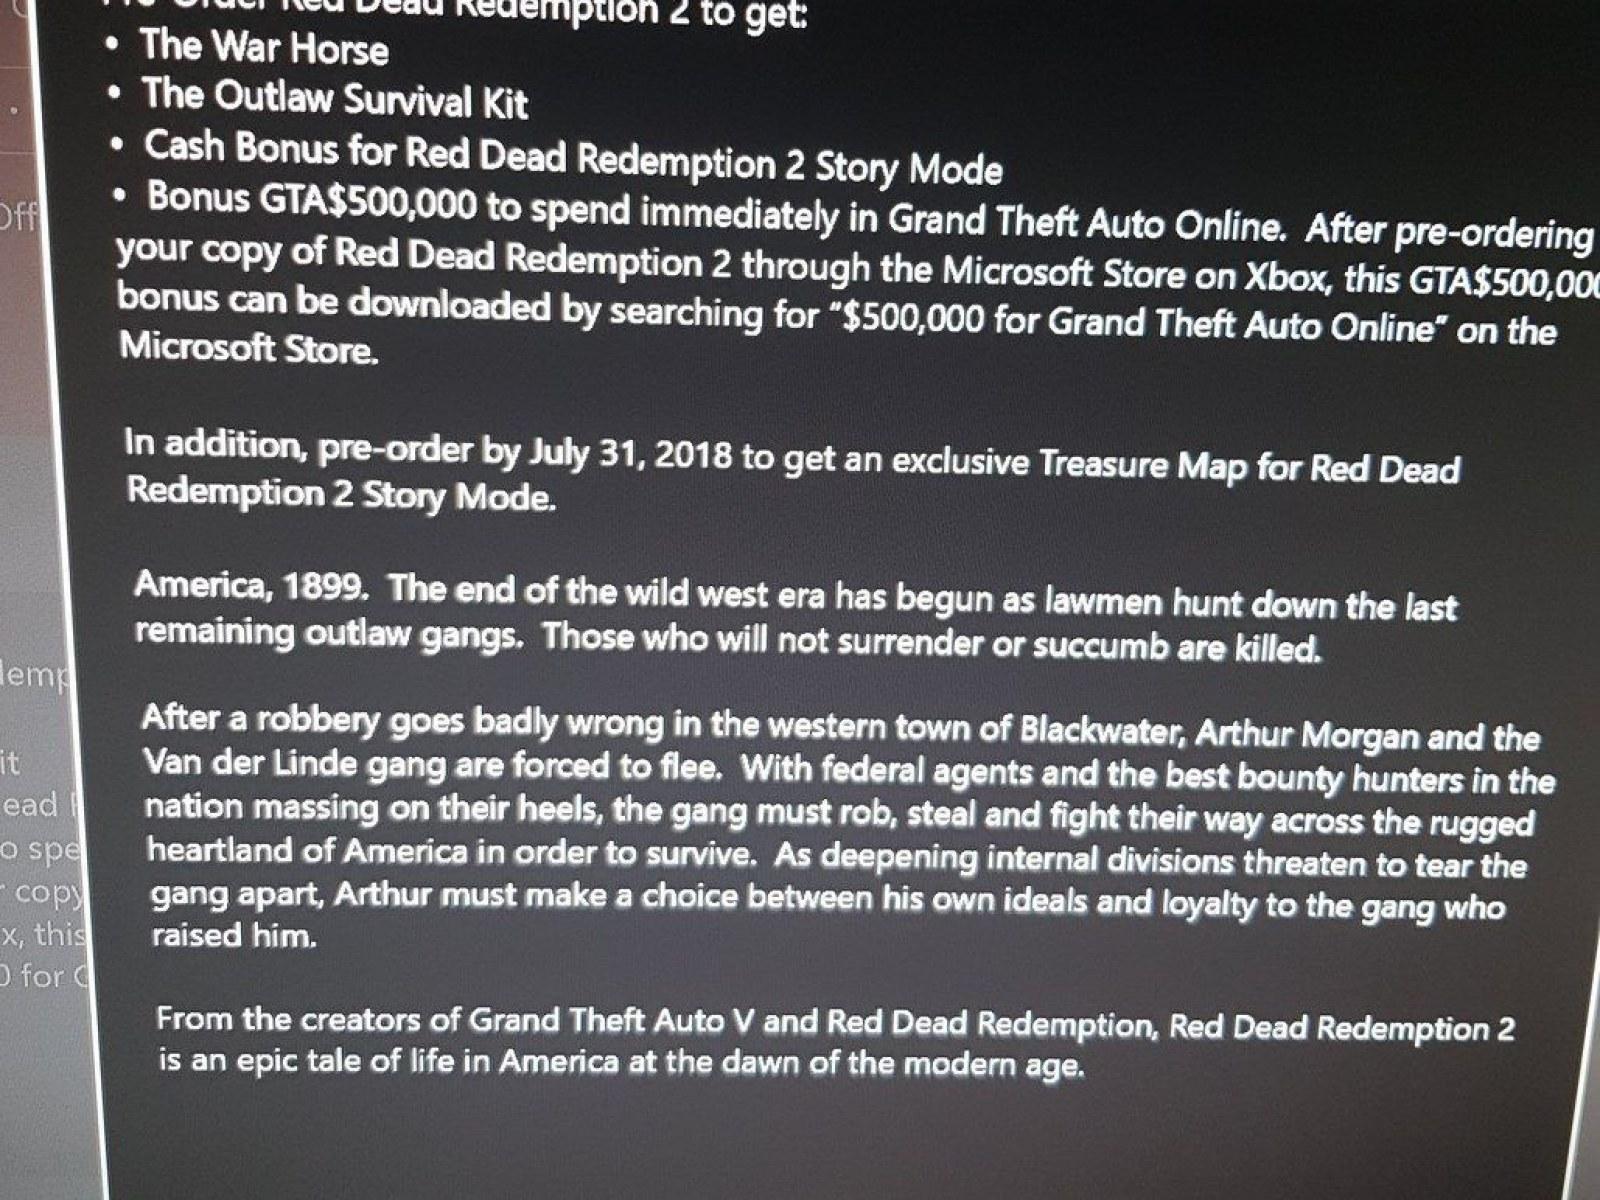 Red Dead Redemption 2' Pre-Order Rewards Leaked, Includes GTA$